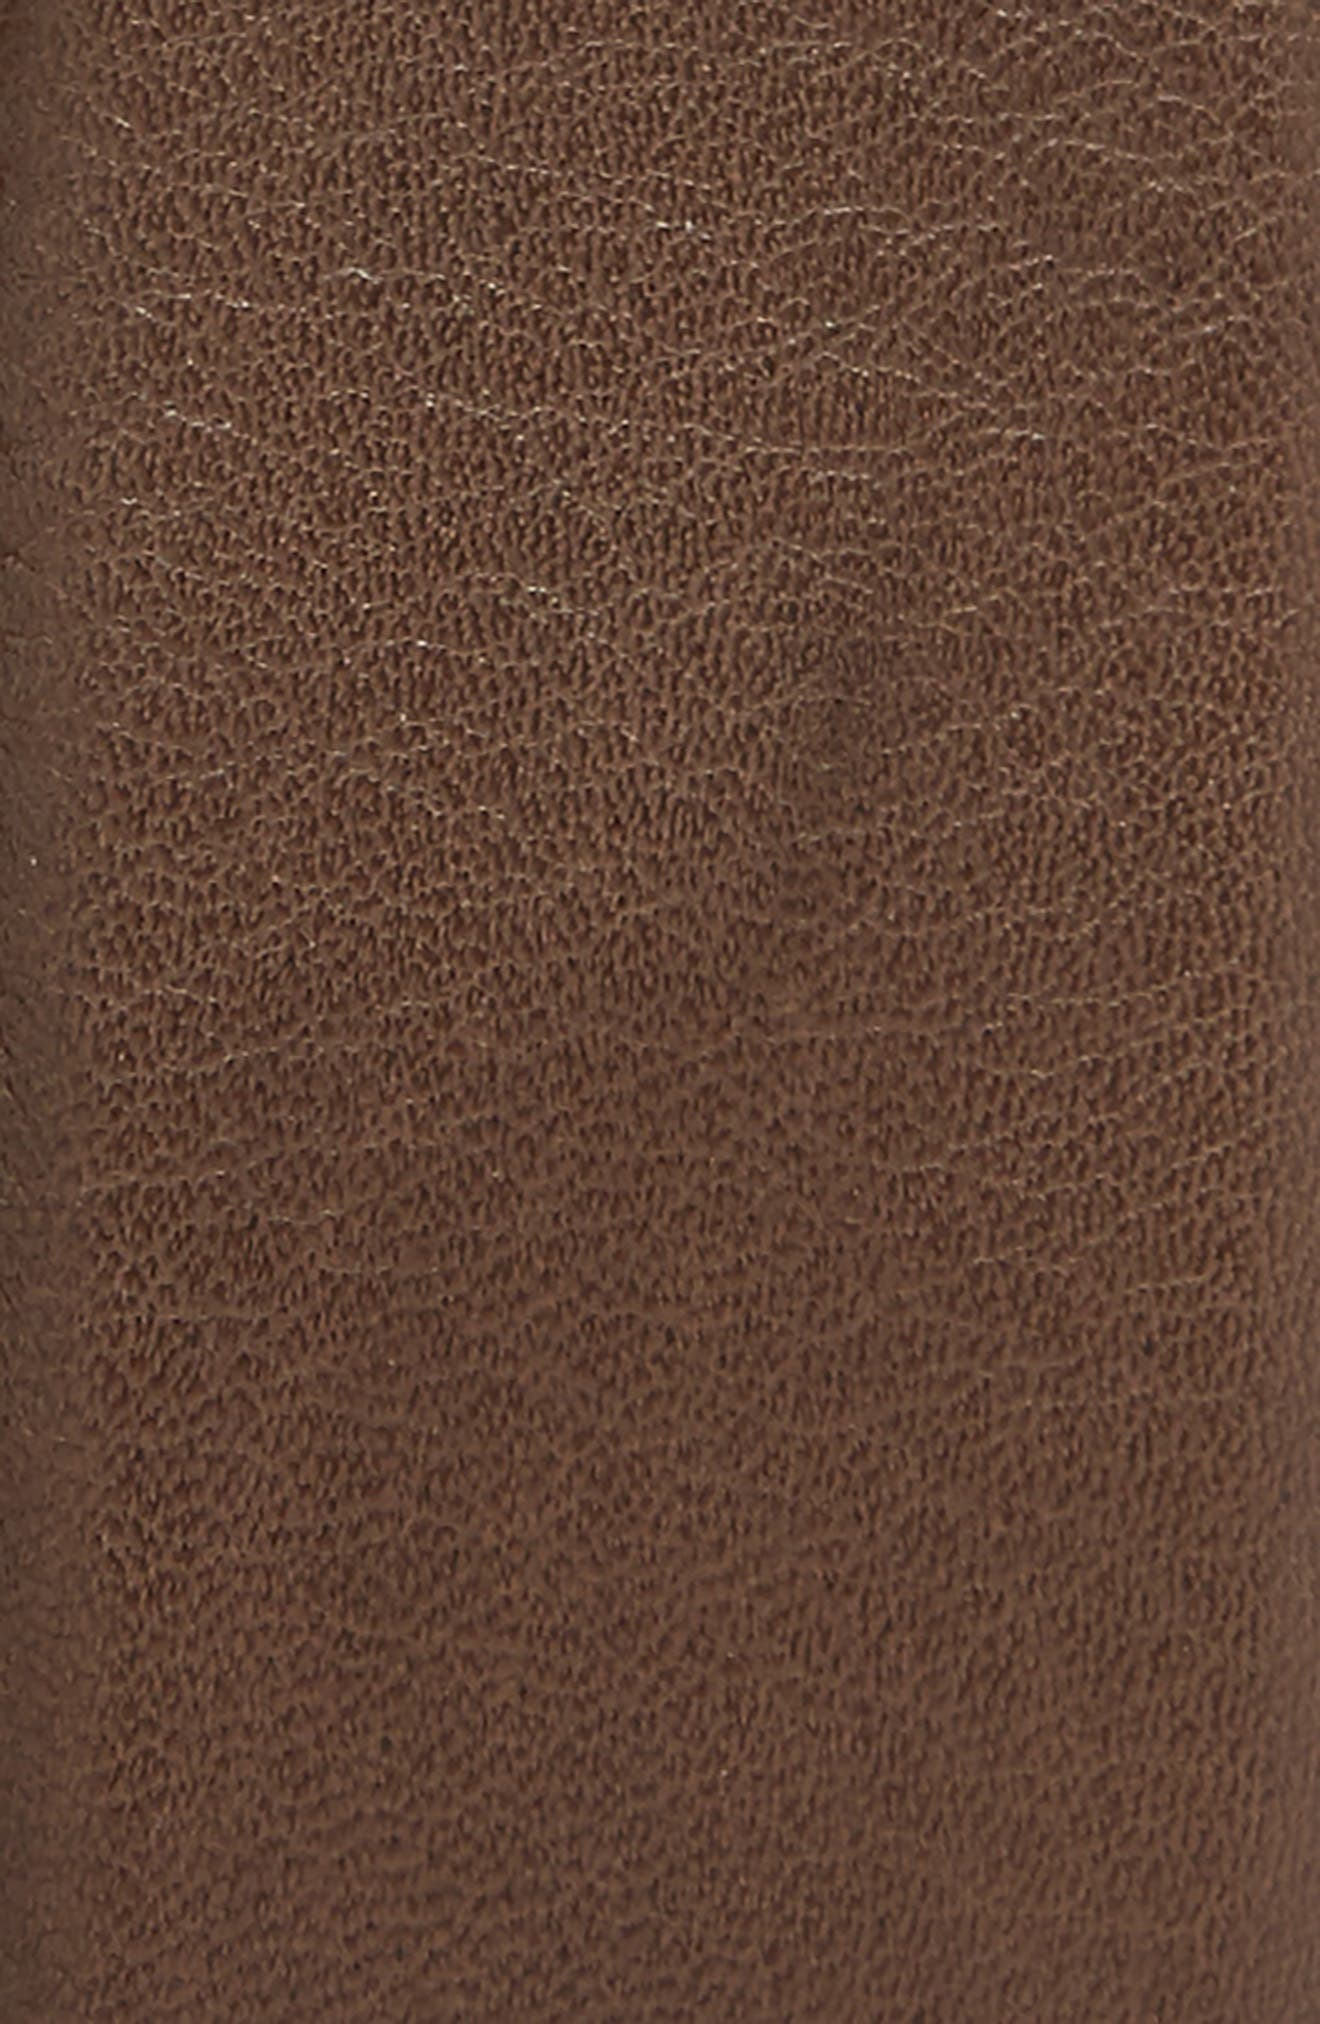 Alternate Image 2  - Salvatore Ferragamo Gancio Leaf Buckle Leather Belt